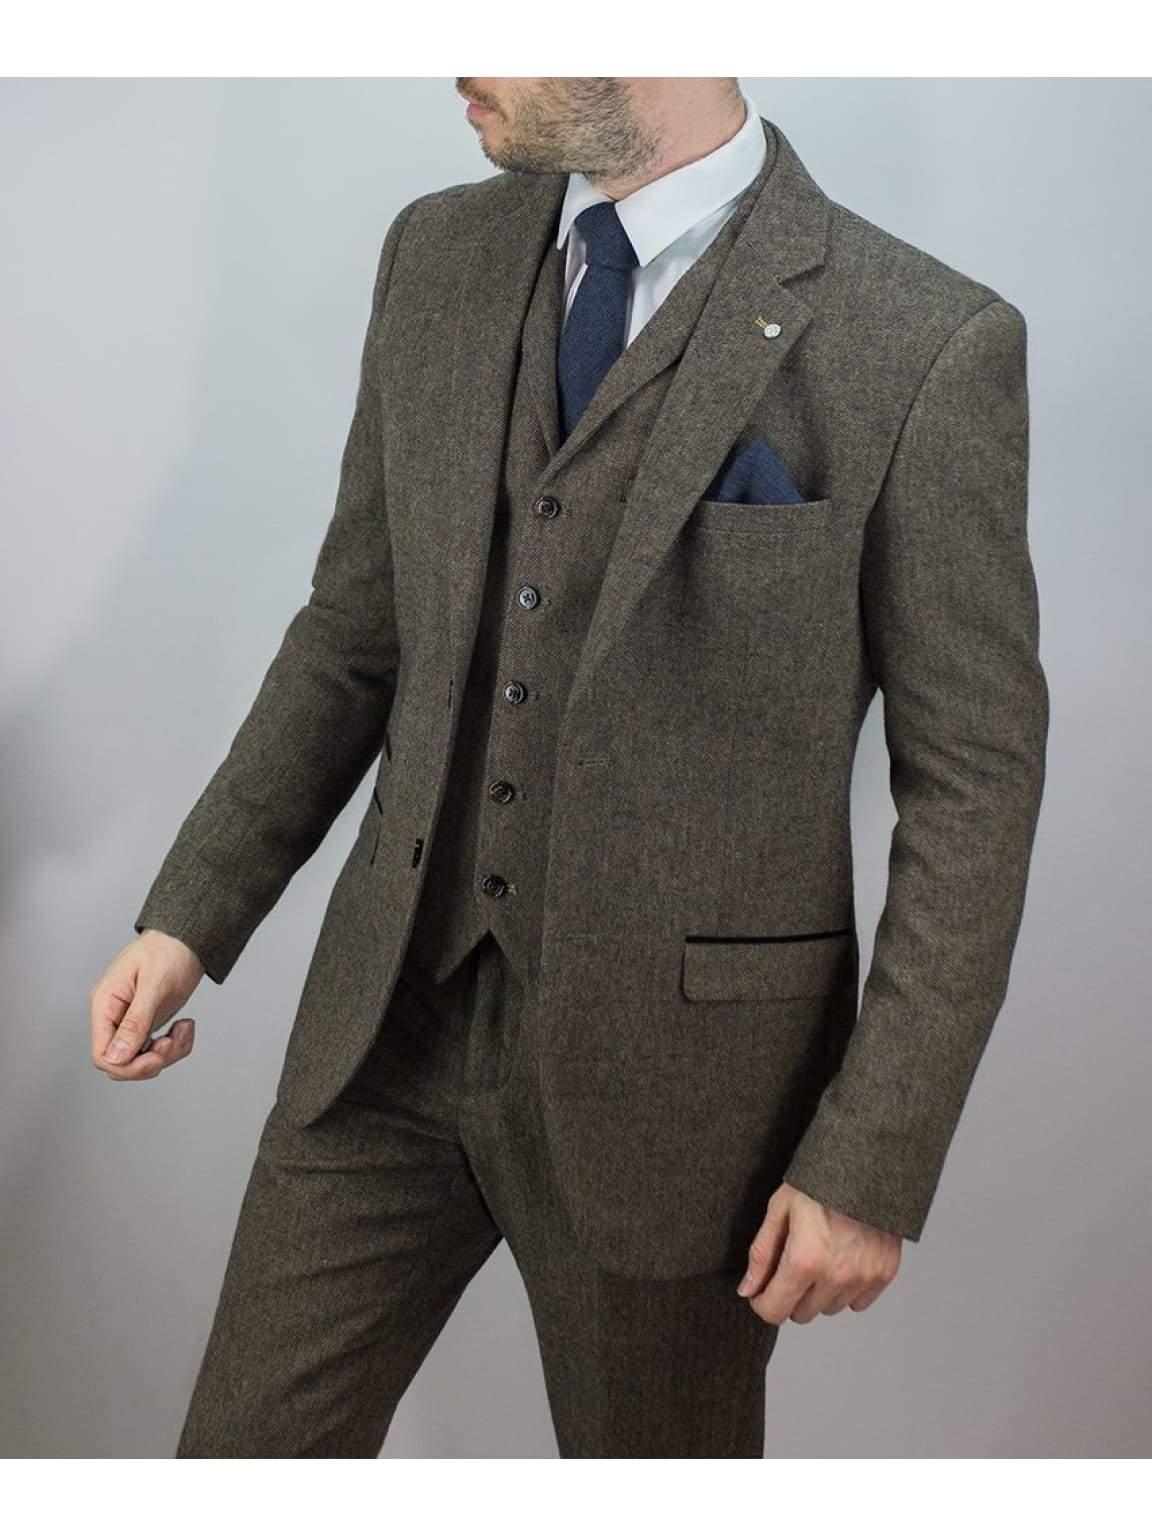 Cavani Brendan Mens Blue Check Slim Fit Suit - Suit & Tailoring